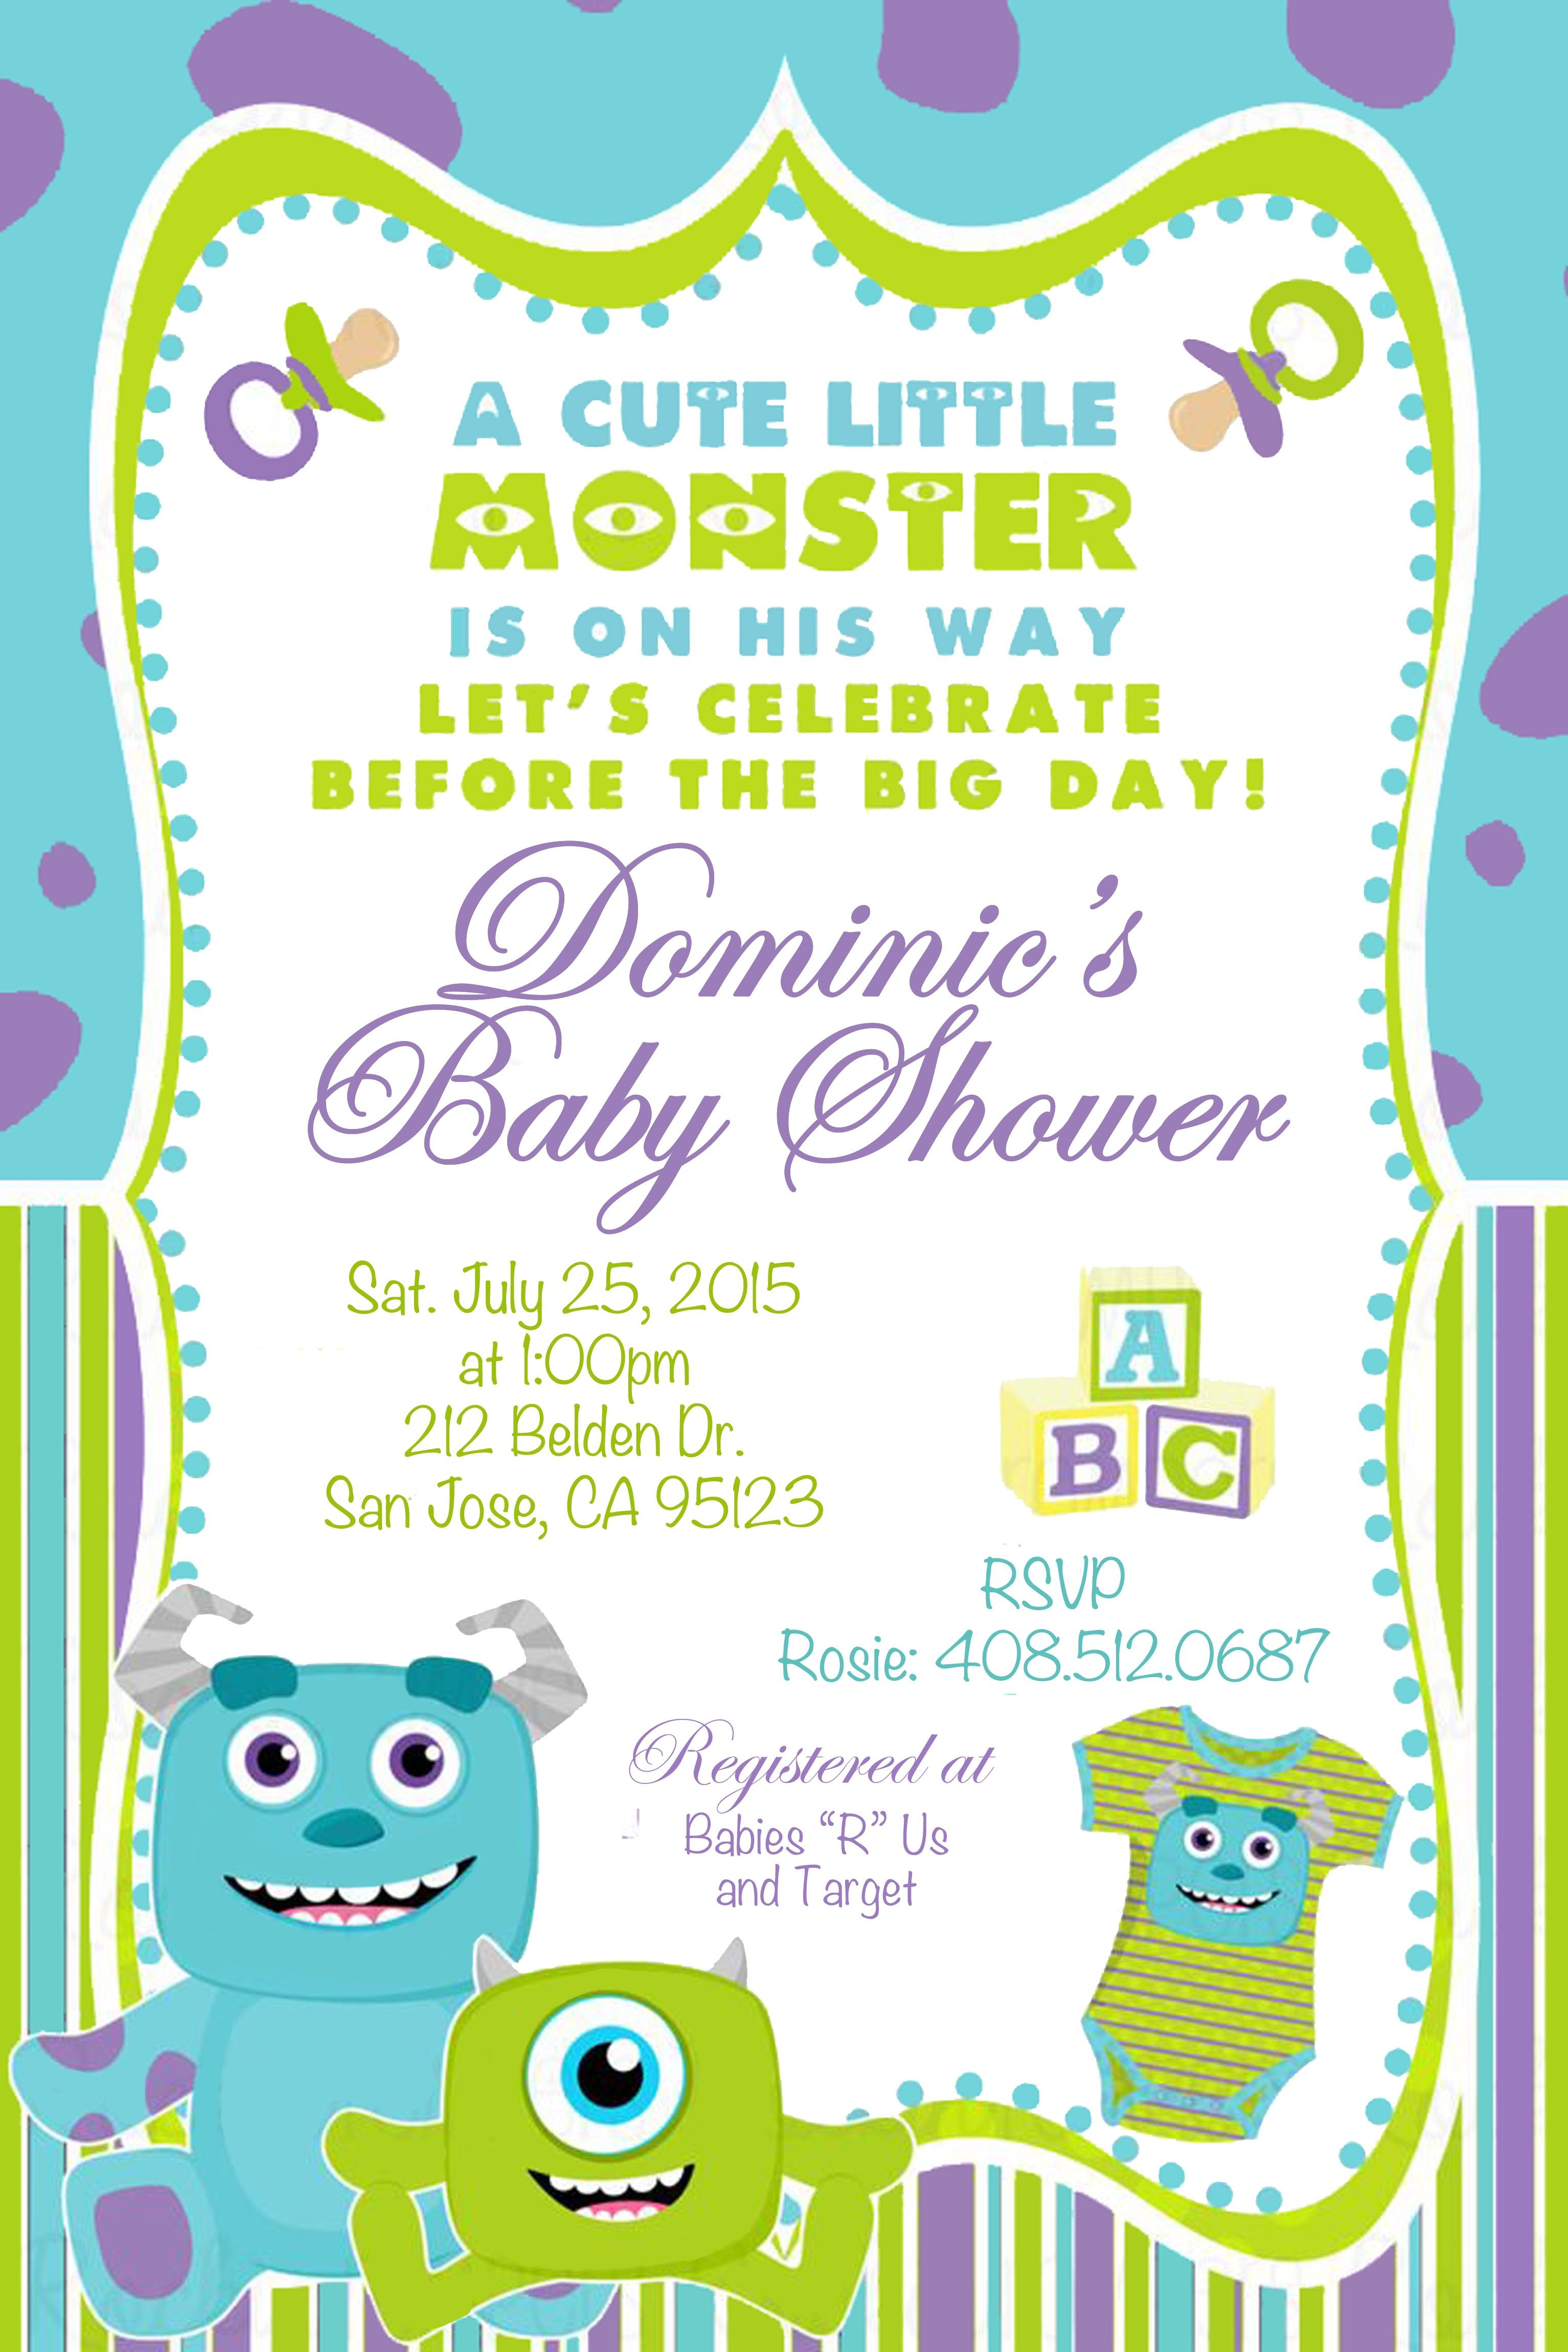 Monsters Inc. Baby Shower Invitation For Custom Orders: j9autra ...